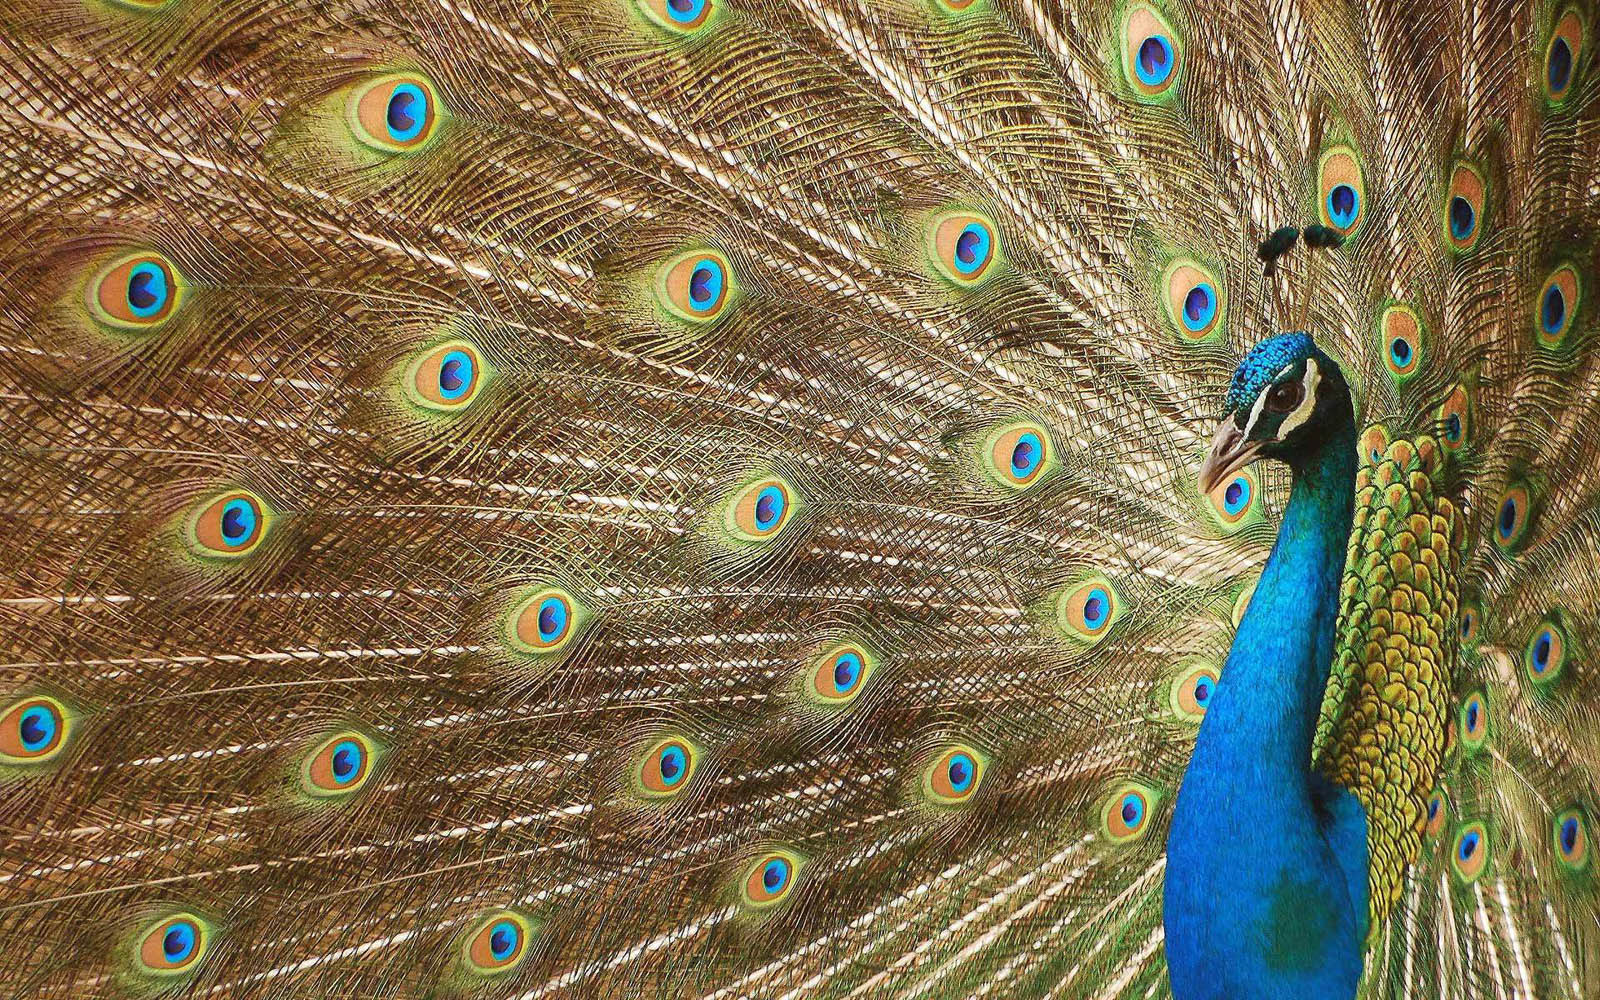 Wallpaper: Peacock Wallpapers